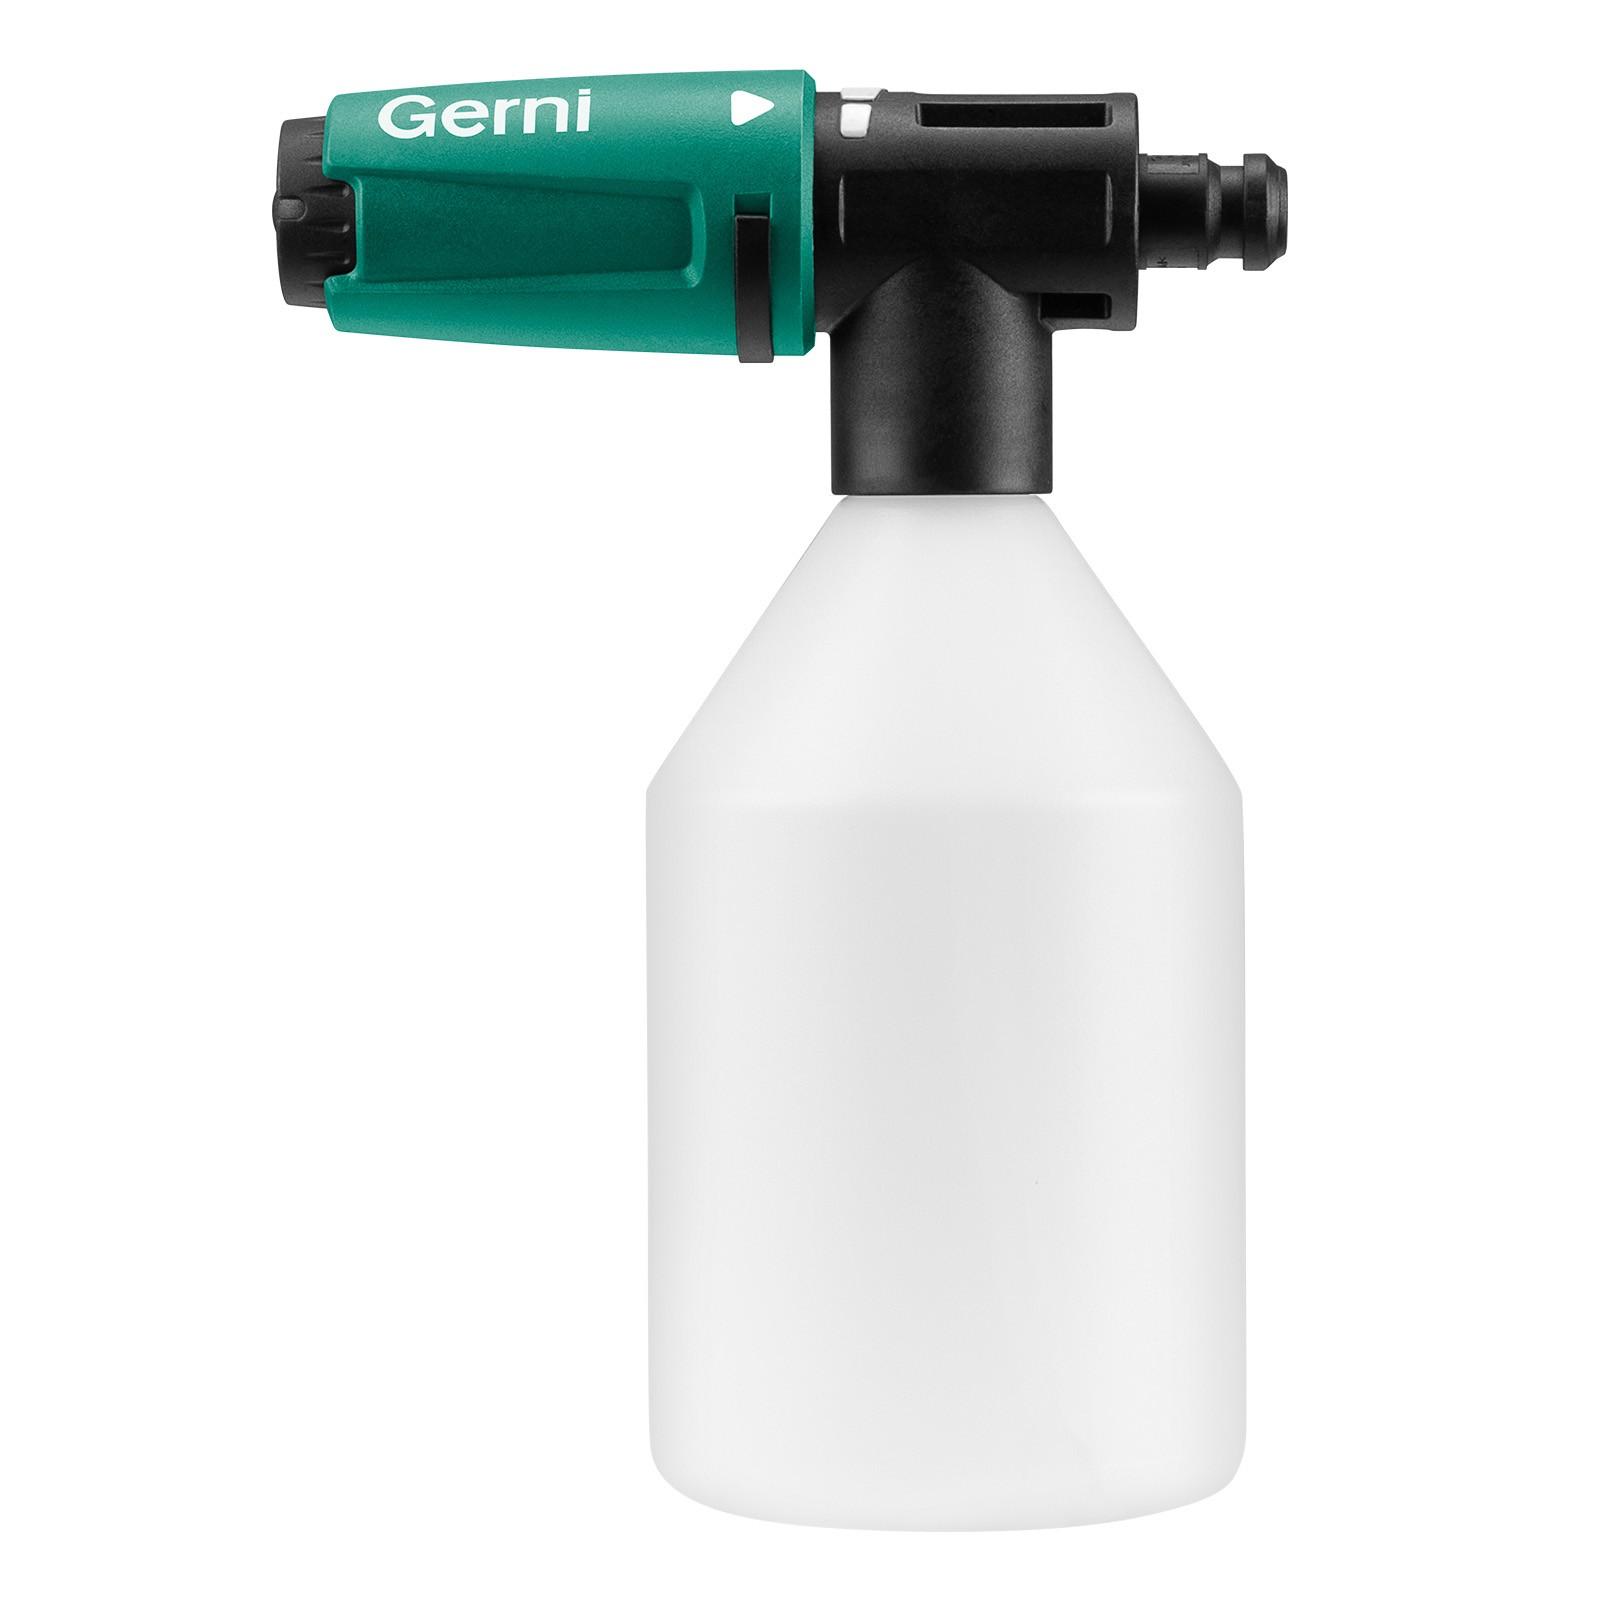 Gerni Super Foam Sprayer - Profile